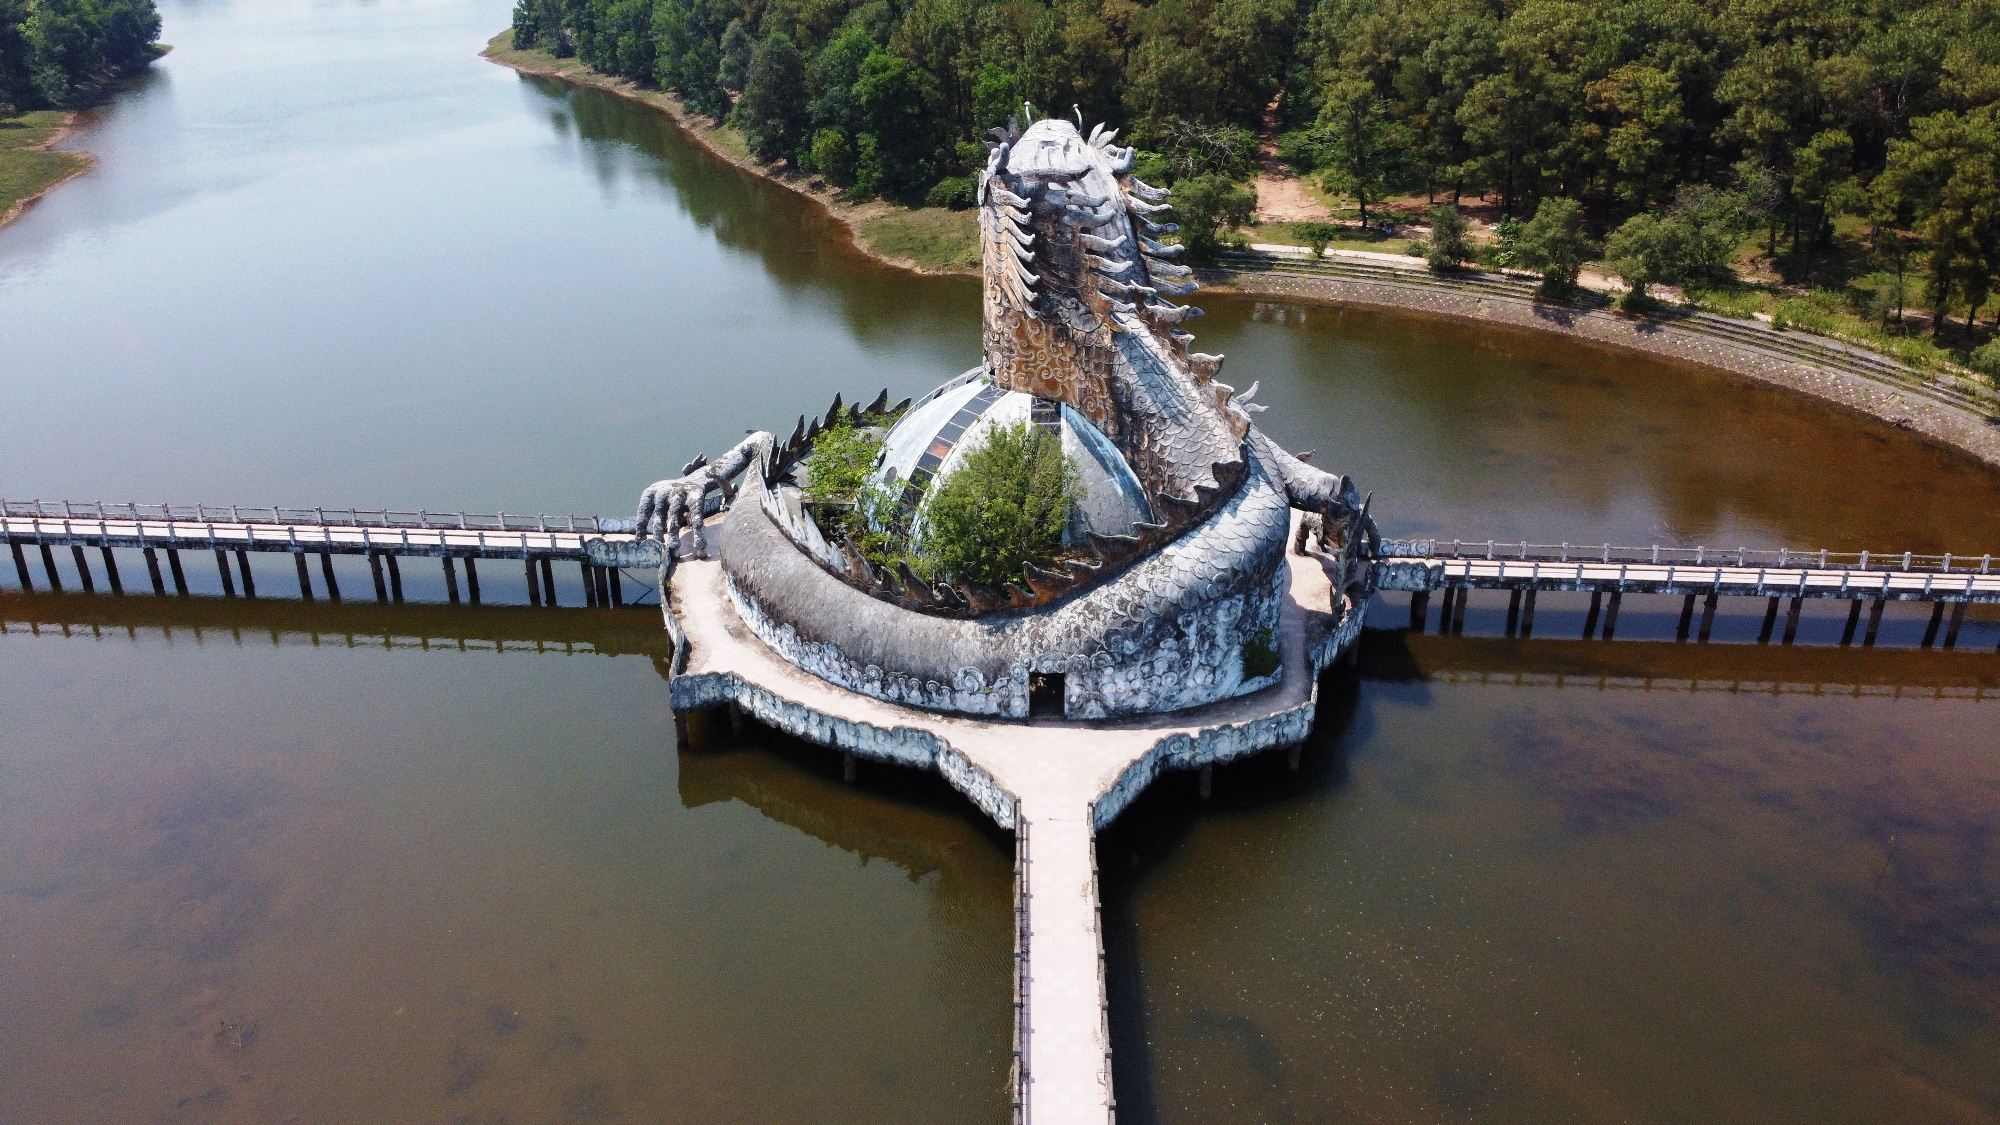 Province seeks investors to revive 'eerie' abandoned water park in central Vietnam